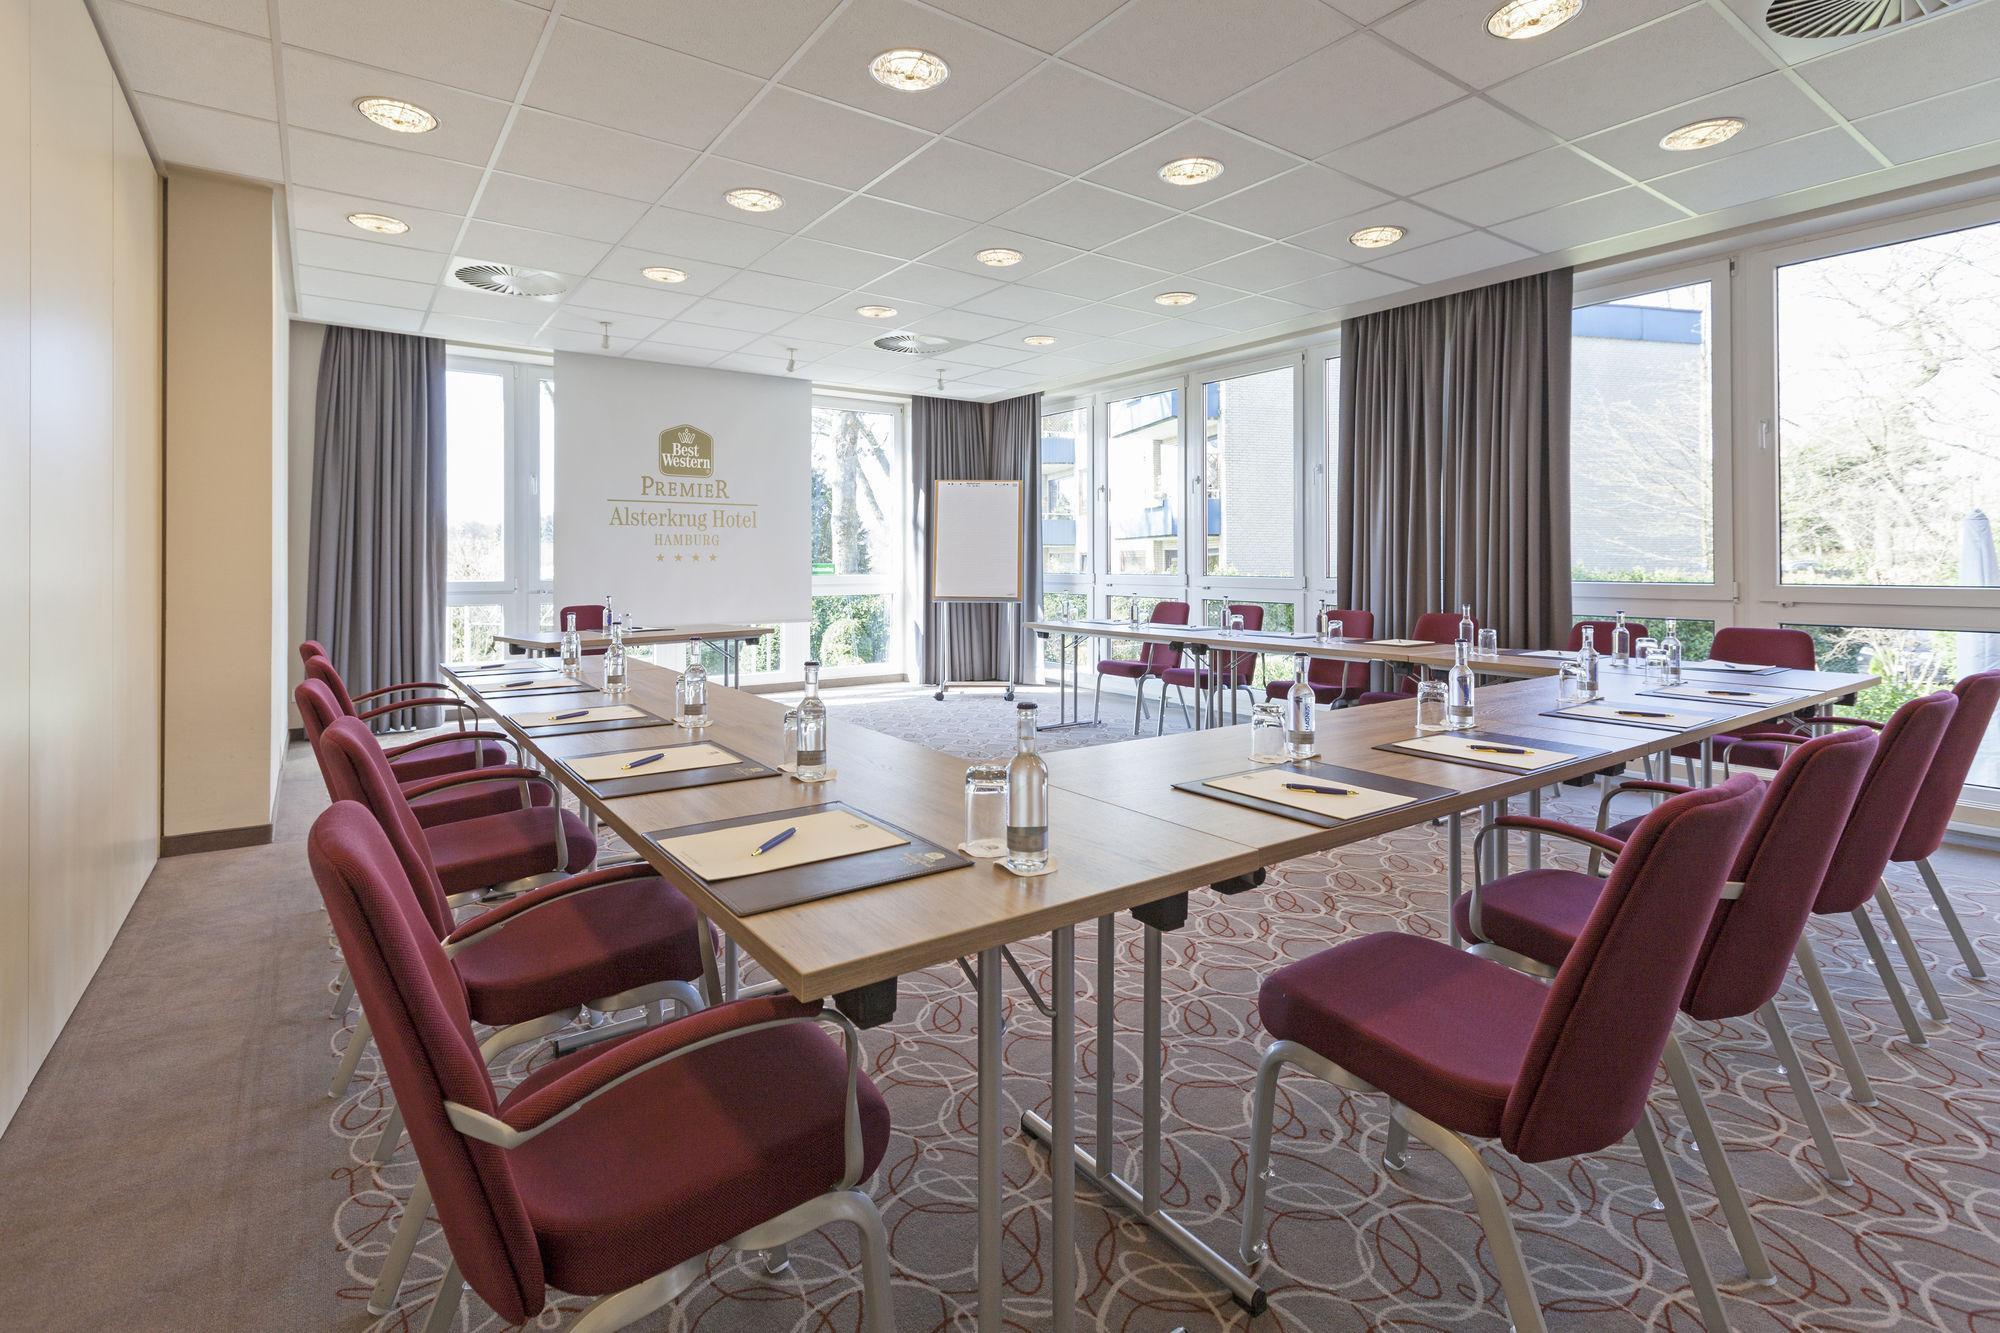 Best Western Premier Alsterkrug Hotel Hotels In Hamburg Skyscanner